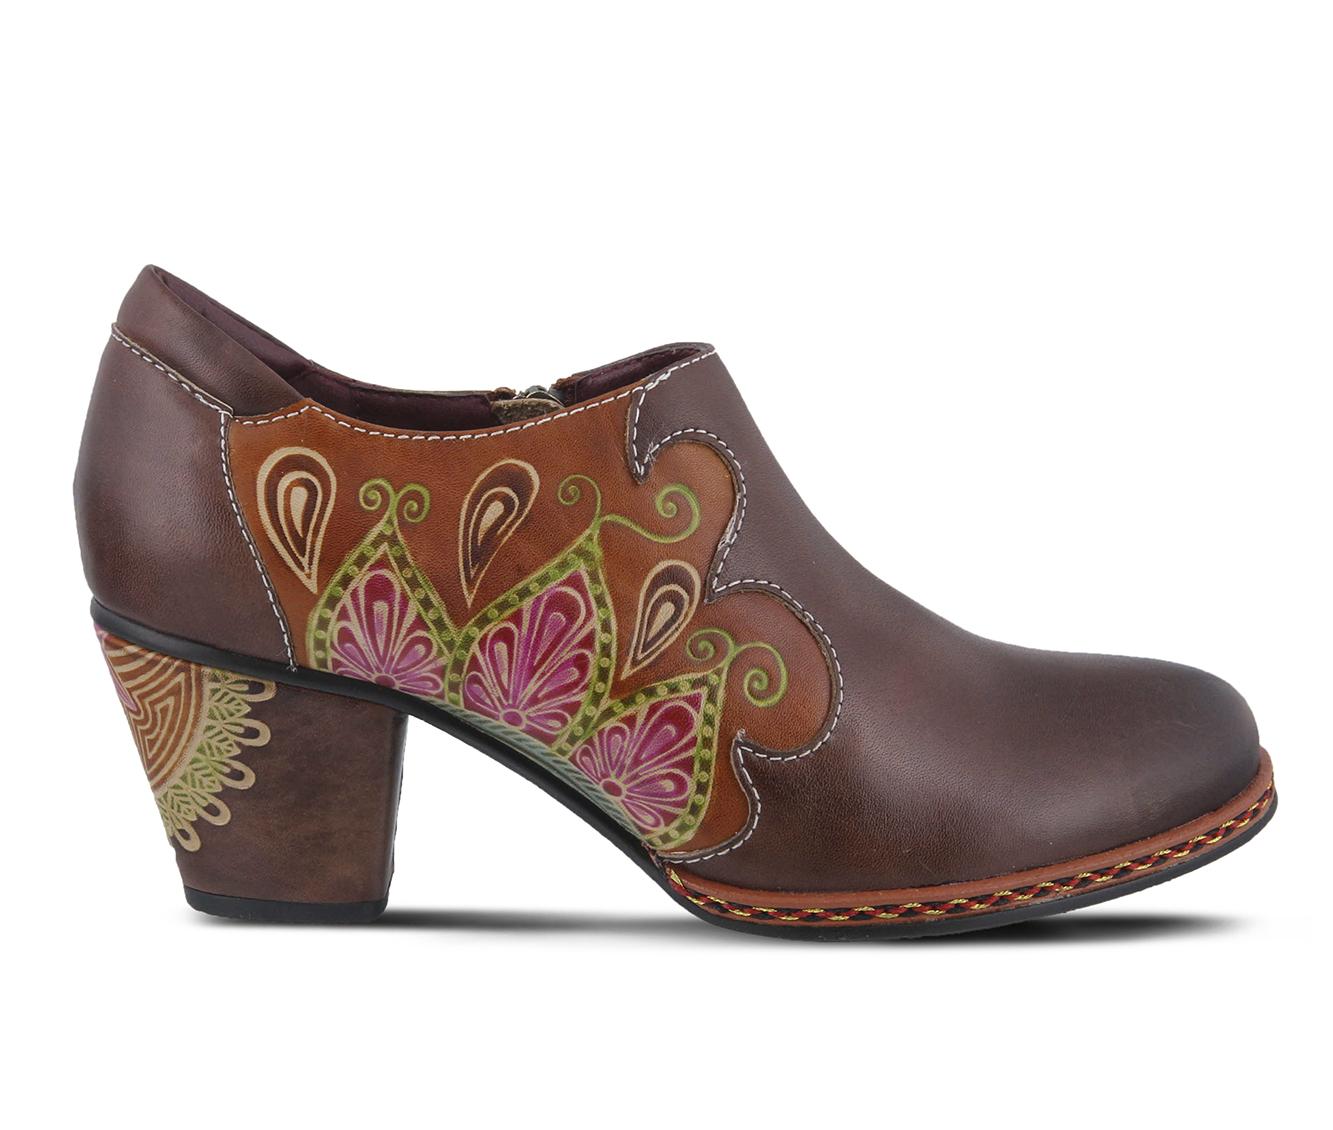 L'Artiste Zami Women's Dress Shoe (Brown Leather)